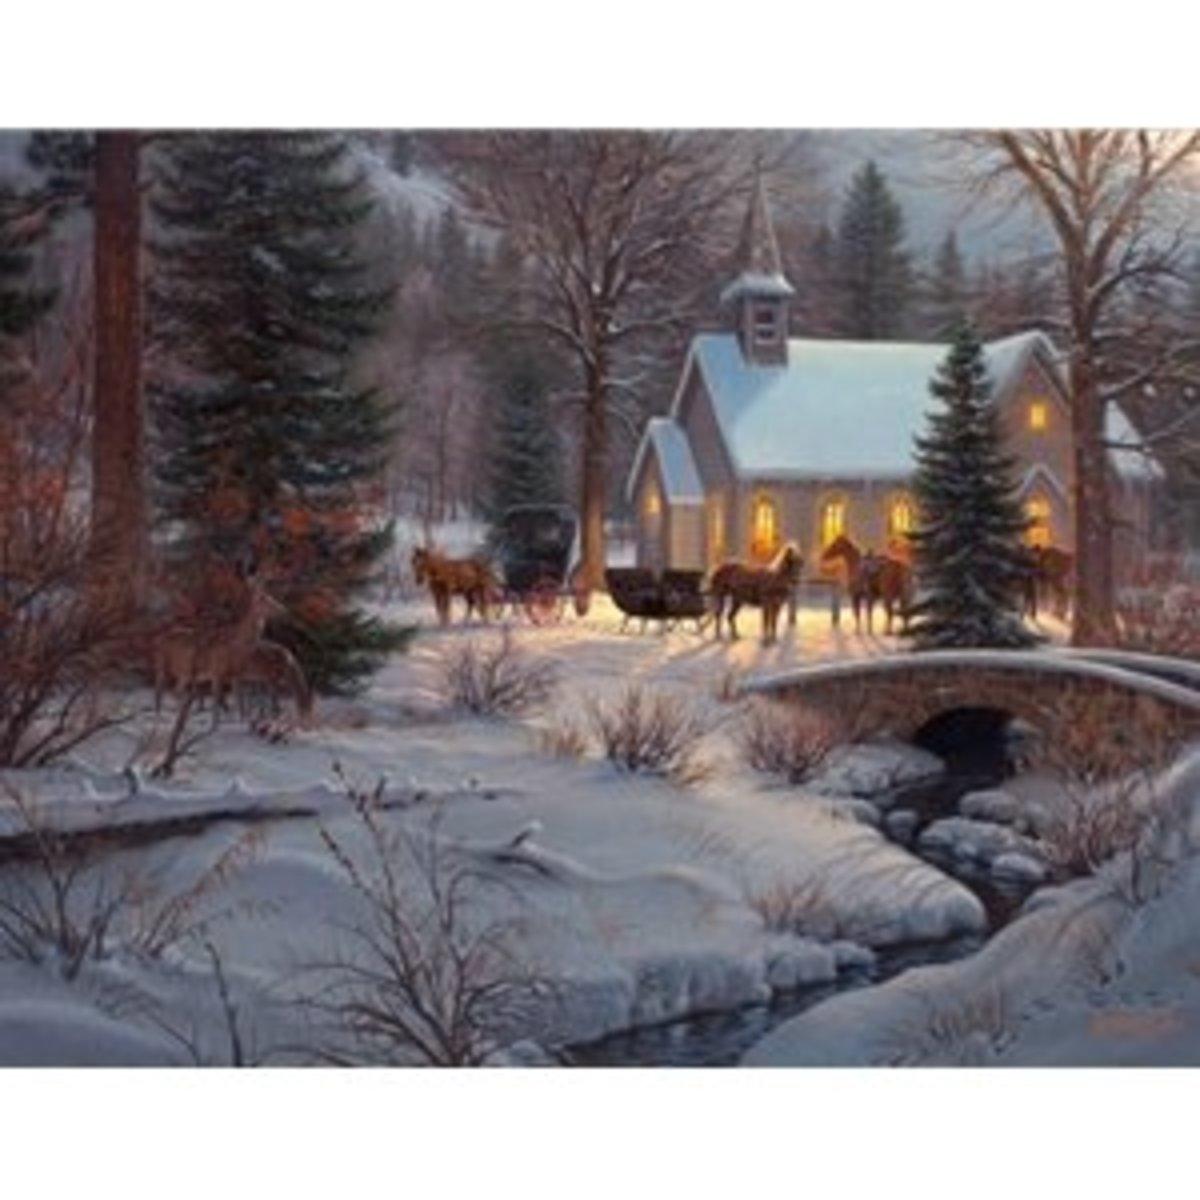 similar painting style to Thomas Kinkade